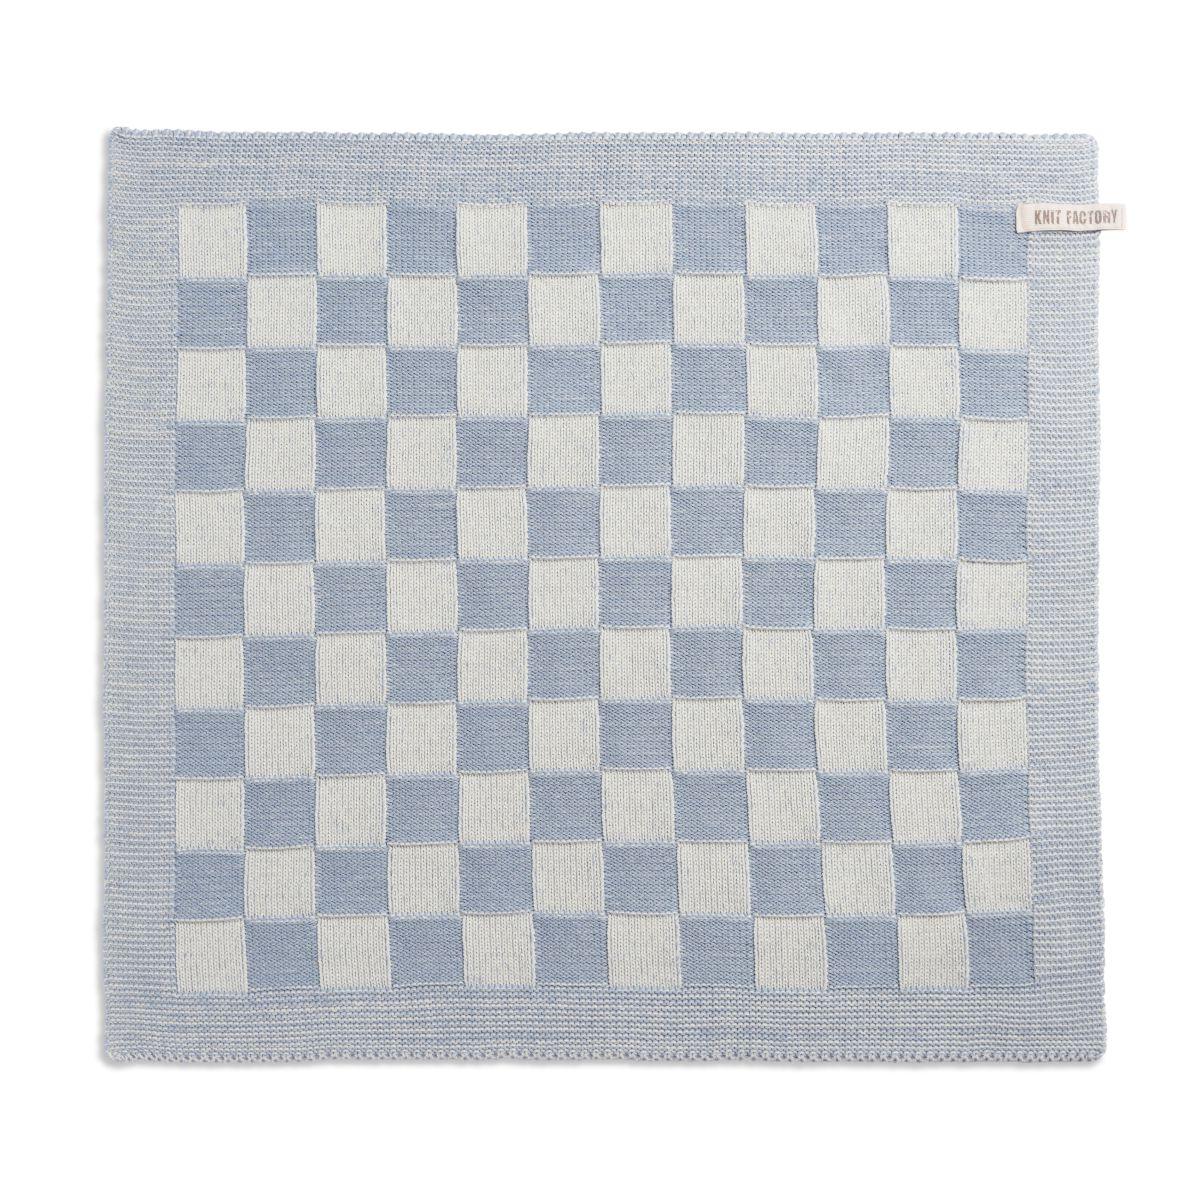 kitchen towel block ecrulight grey